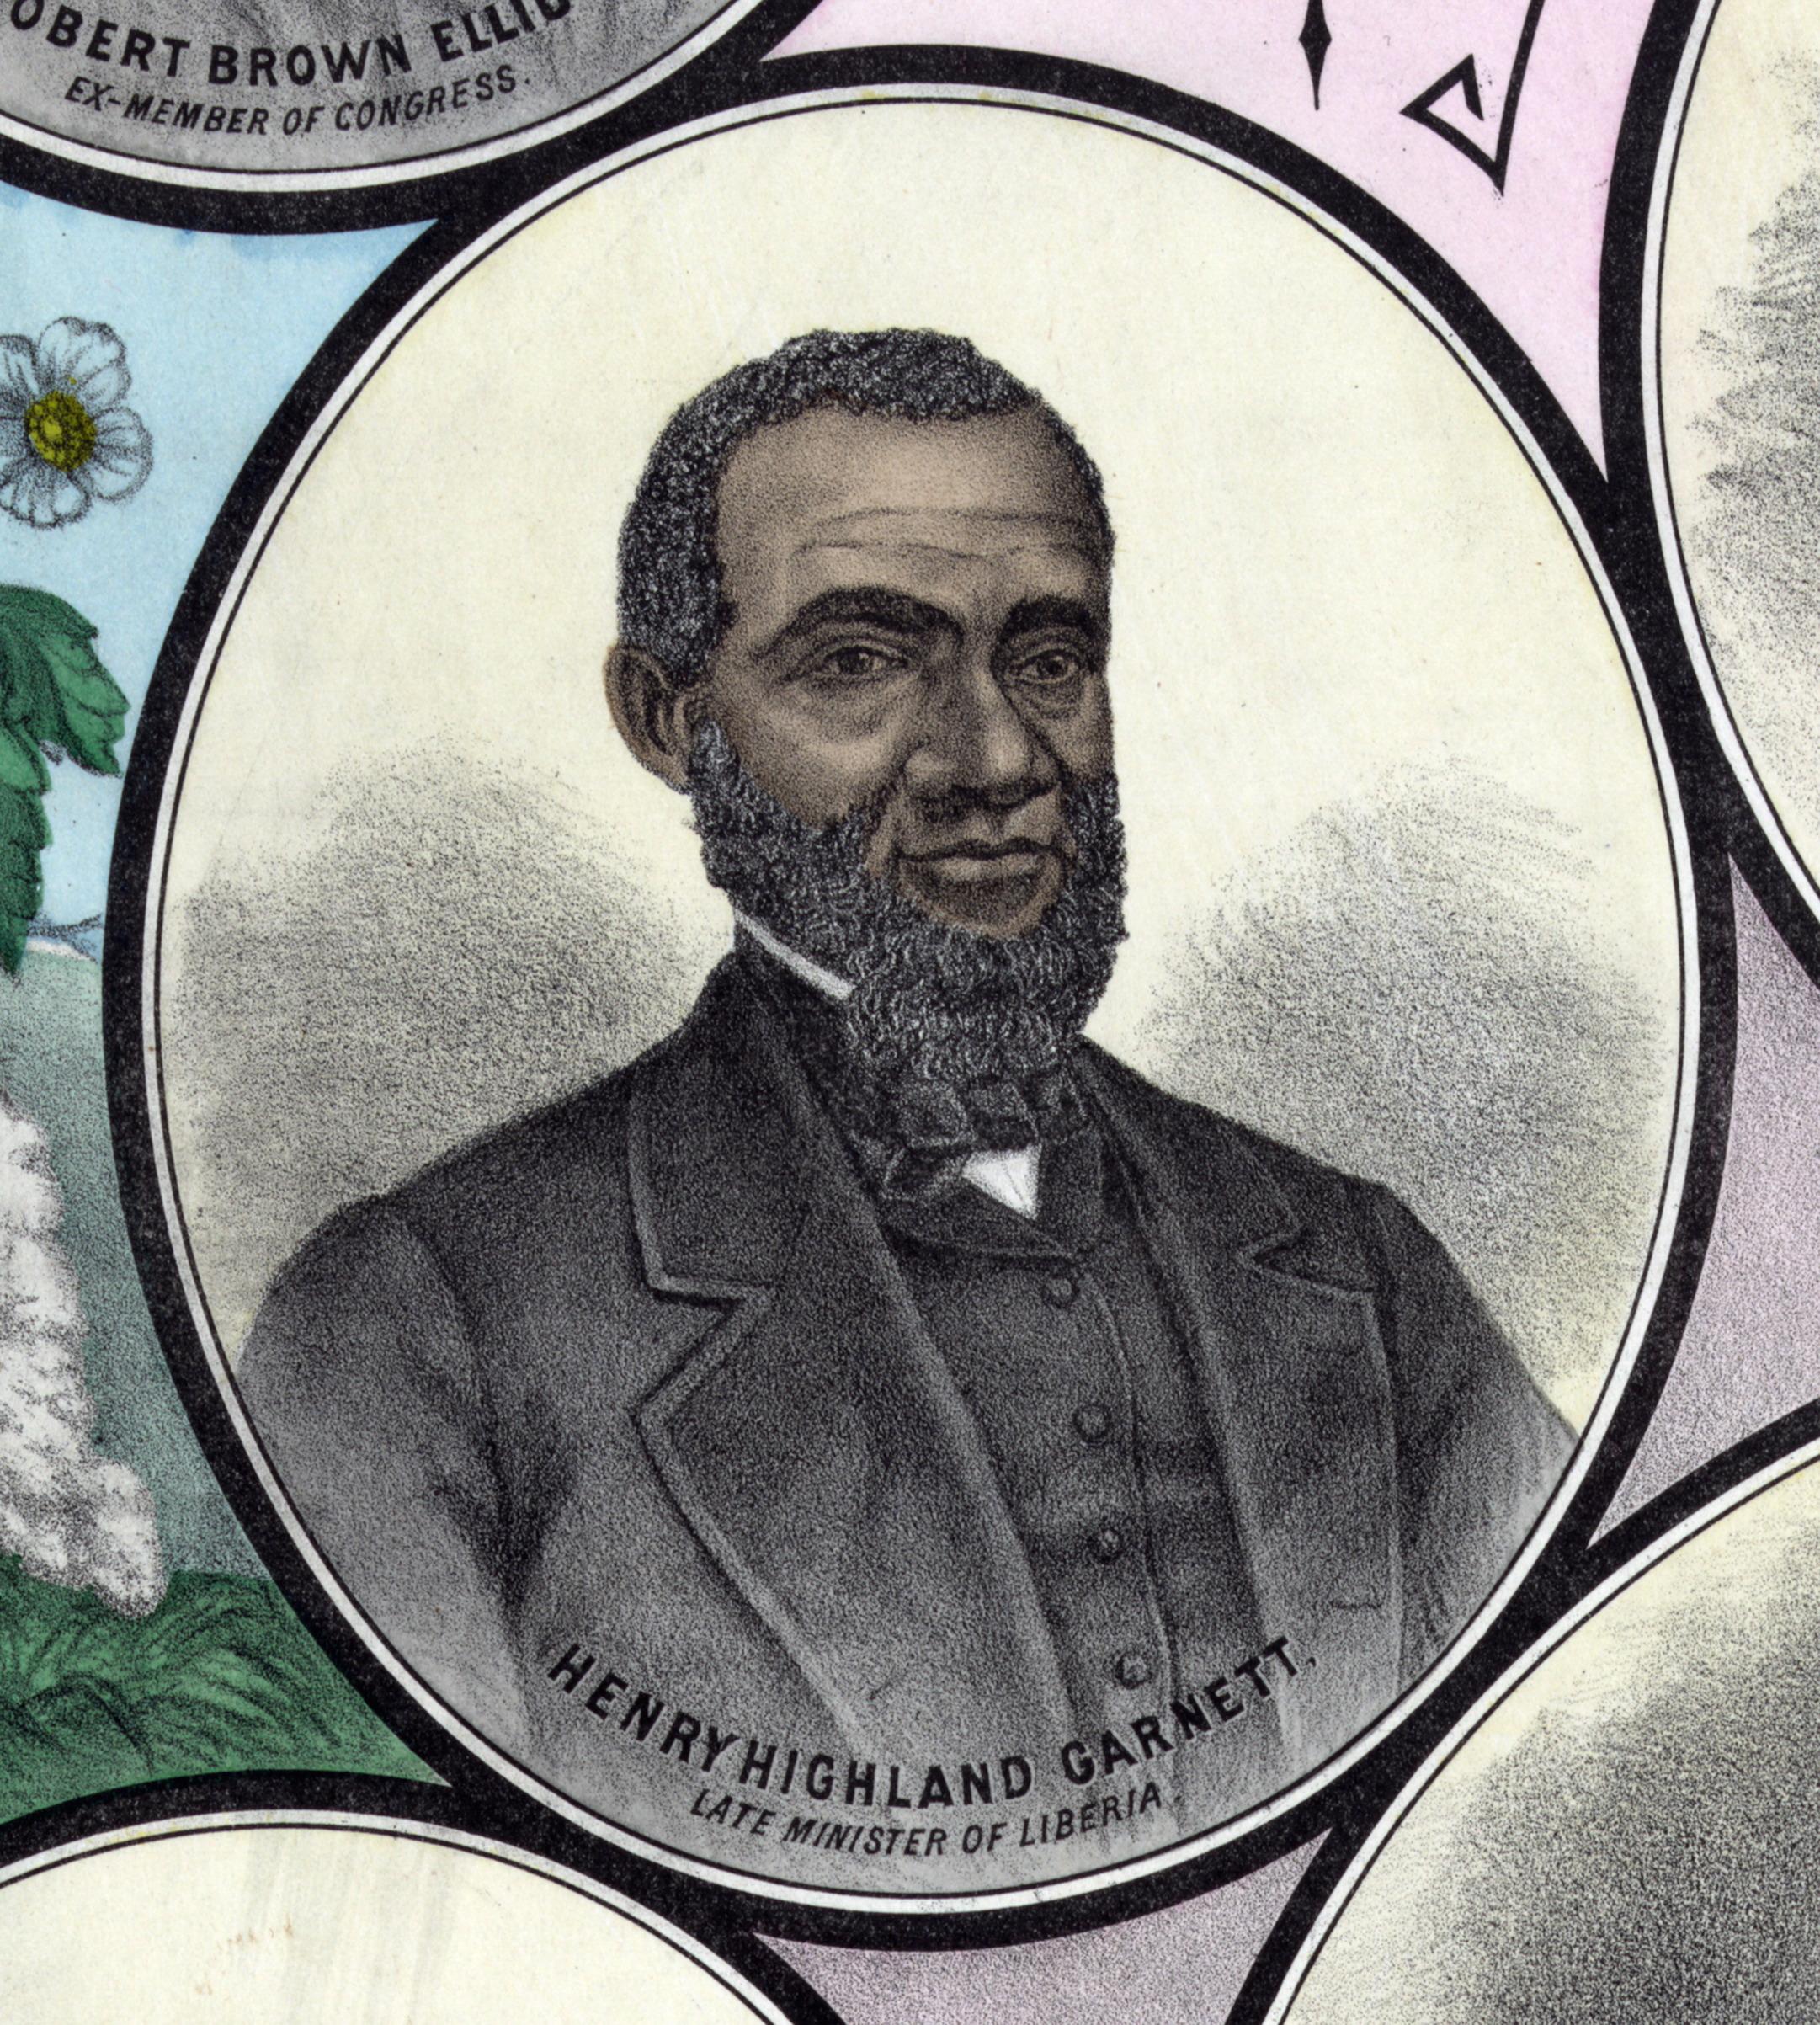 Illustrated portrait of Henry Highland Garnet (1815-1882), African American abolitionist.